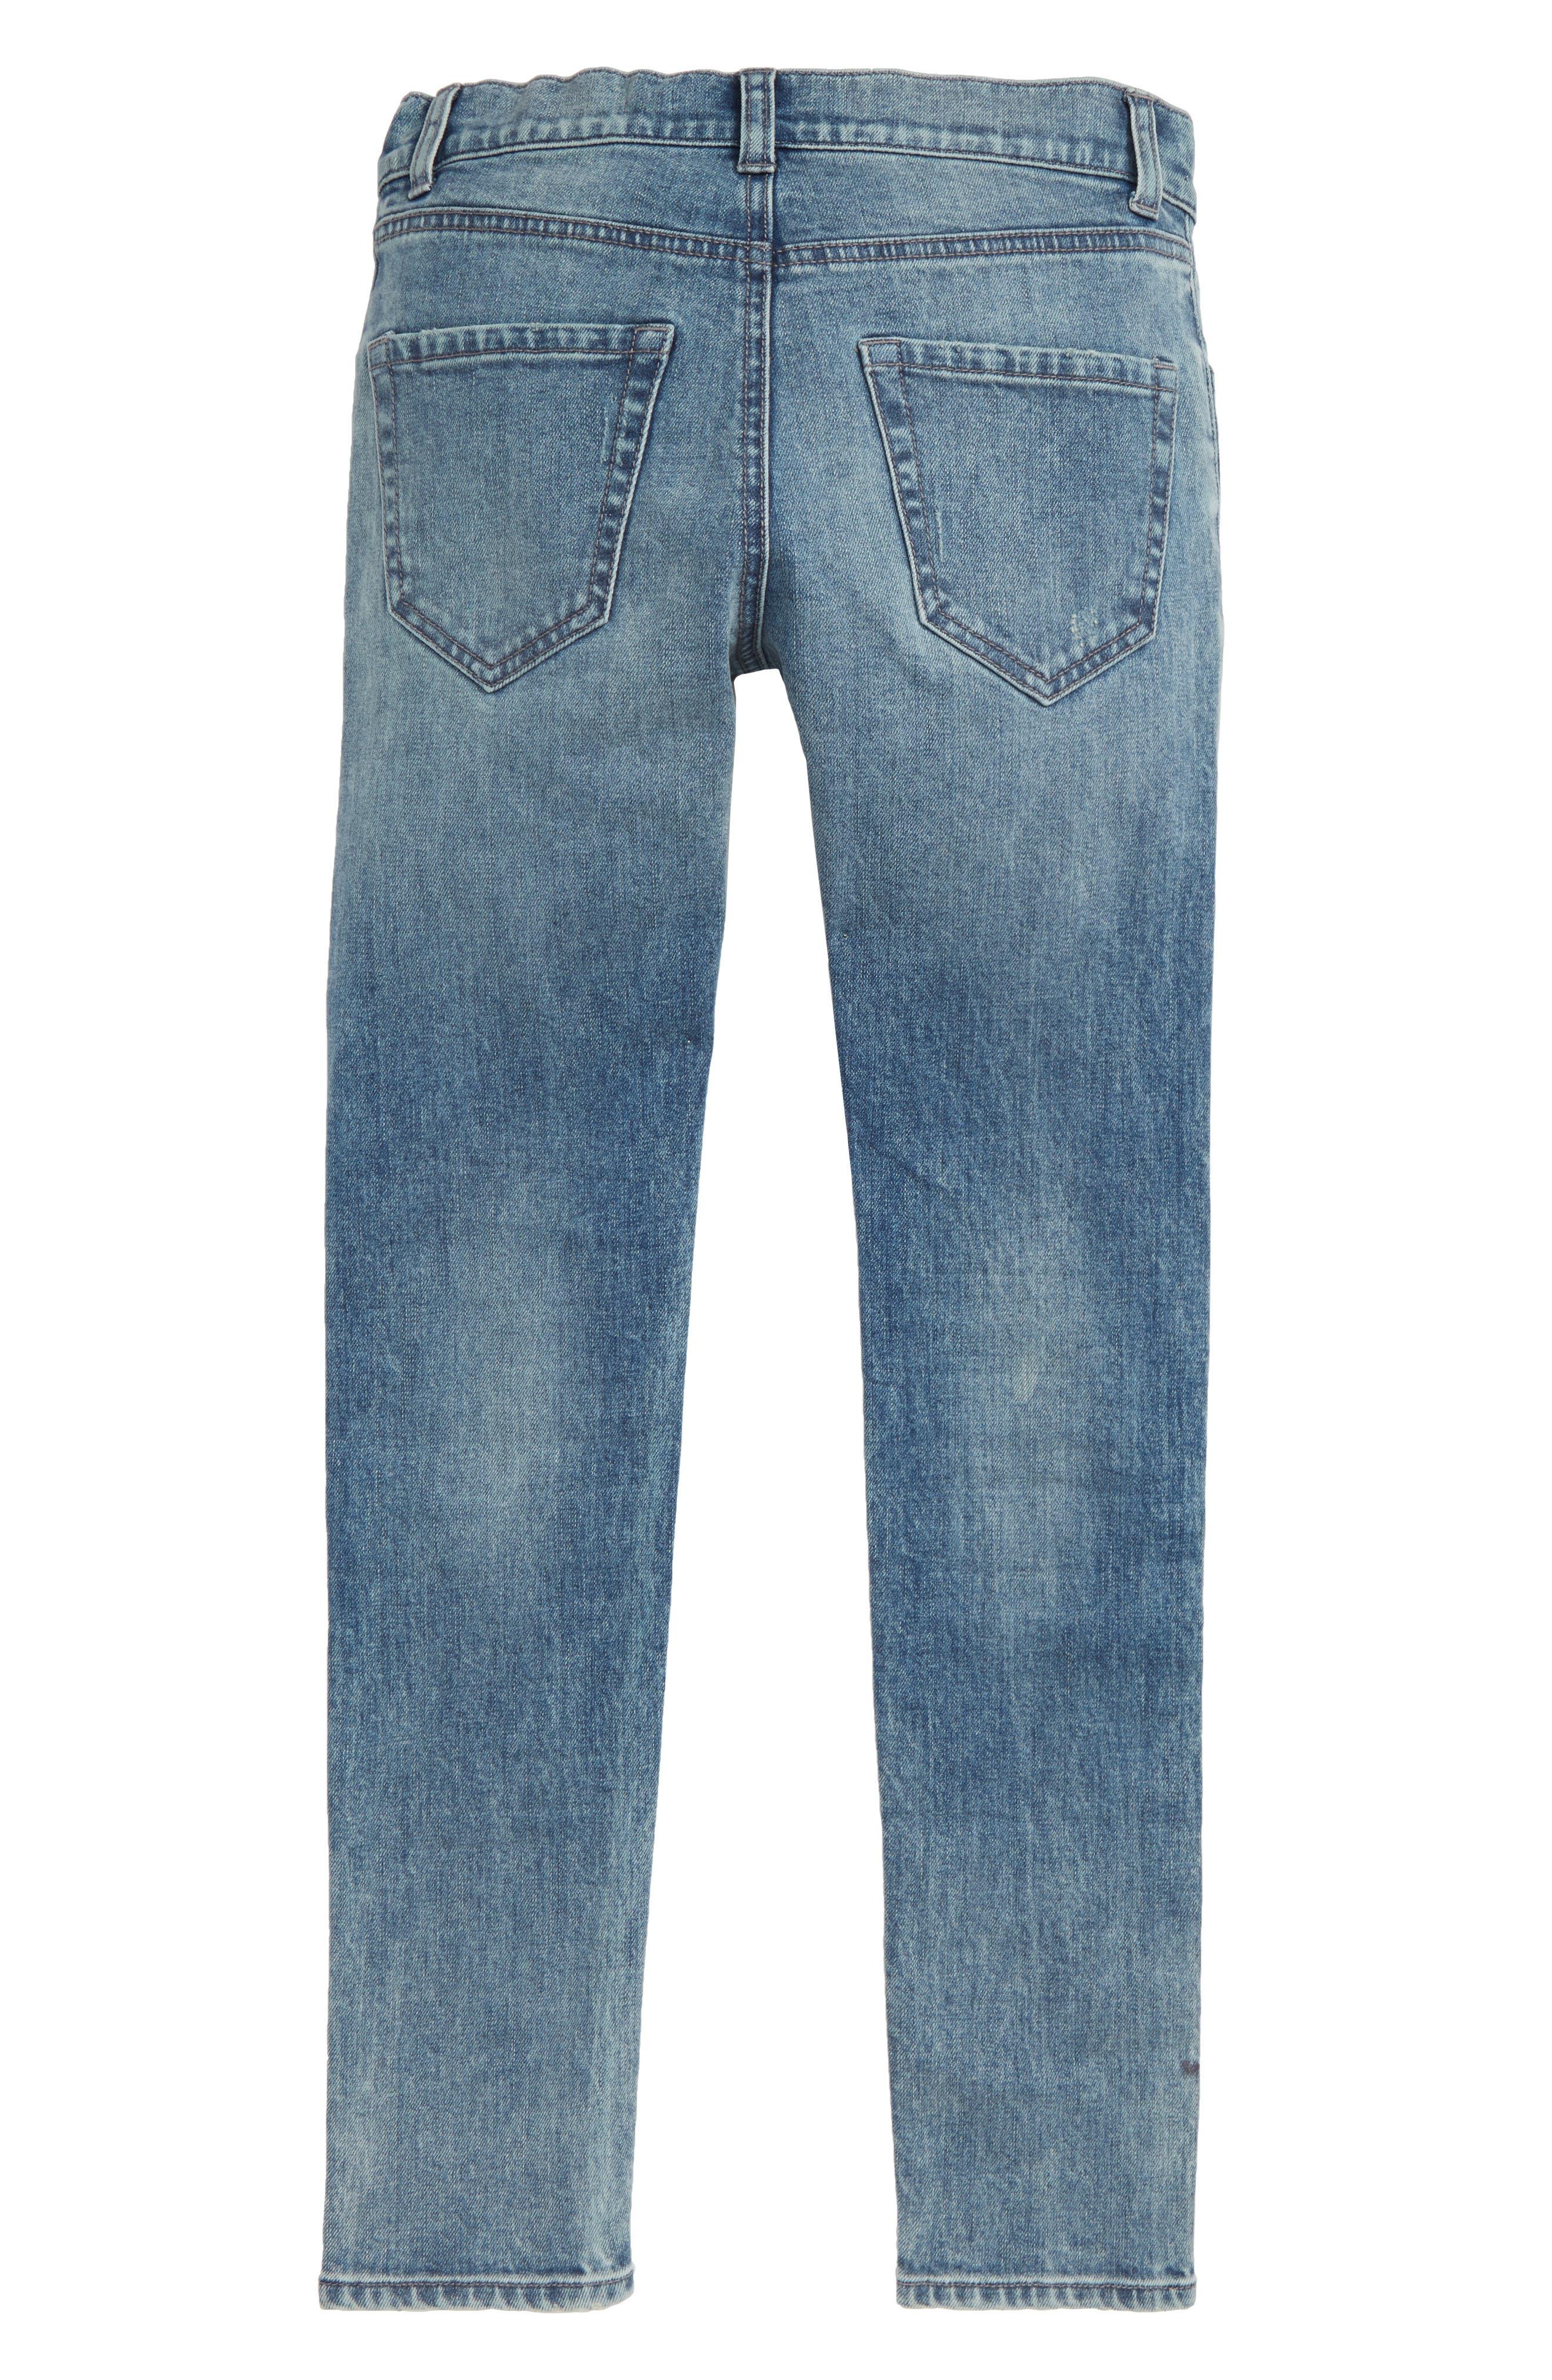 Treaure & Bond Light Wash Jeans,                             Alternate thumbnail 2, color,                             ACID FADE WASH